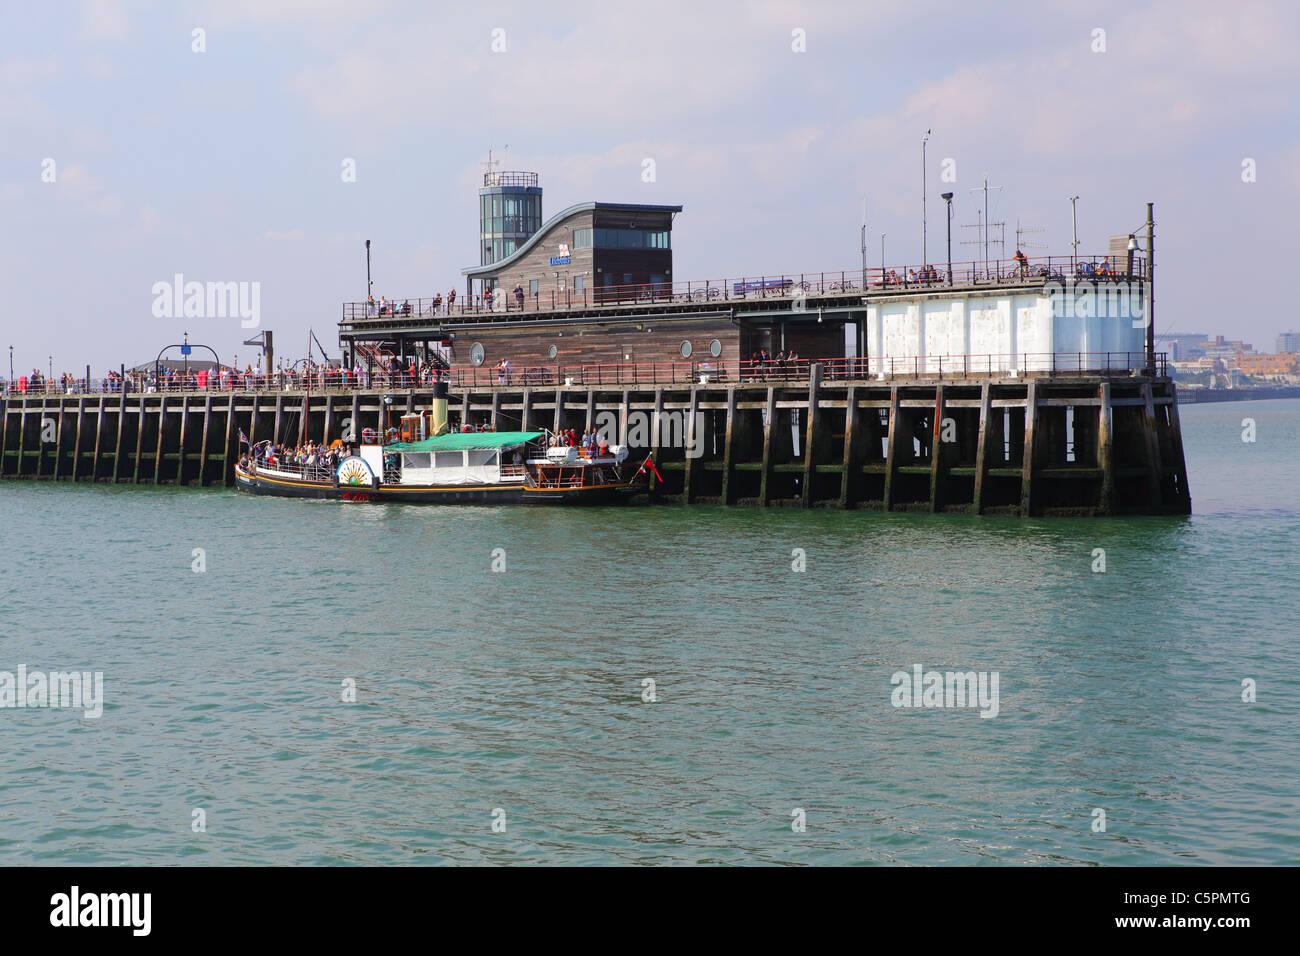 Waverley Paddle Steamer at Southend Pier landing stage, Thames Estuary, Essex, UK - Stock Image